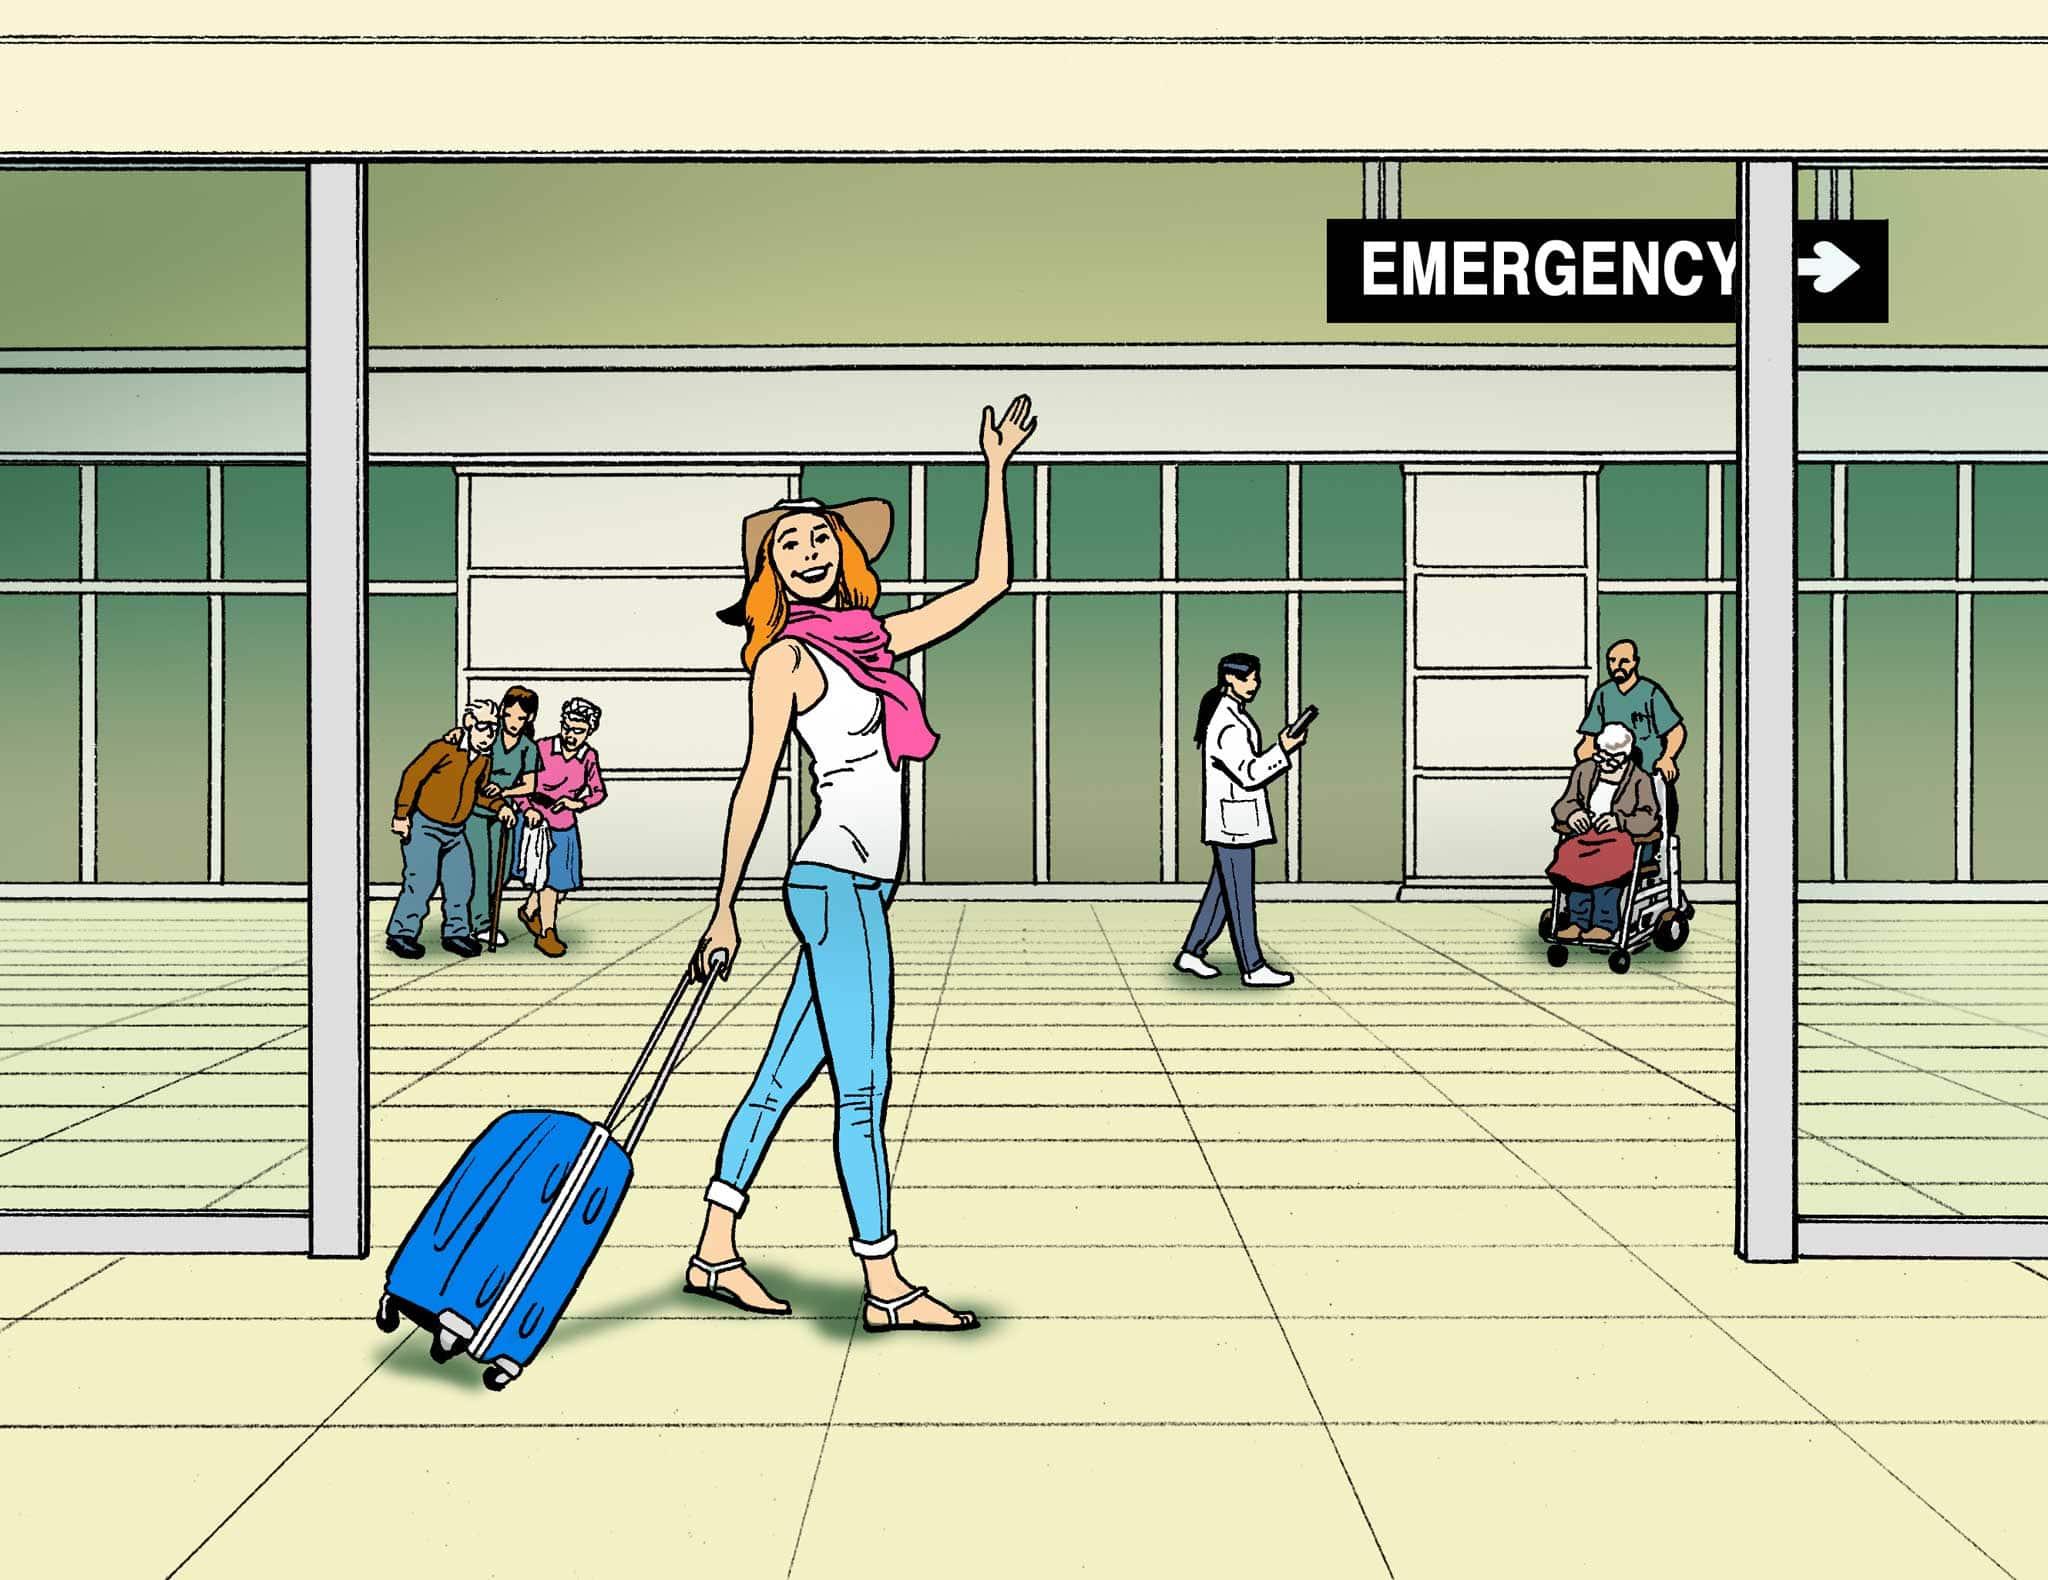 KH3437D-hospital-lobby-bon-voyage